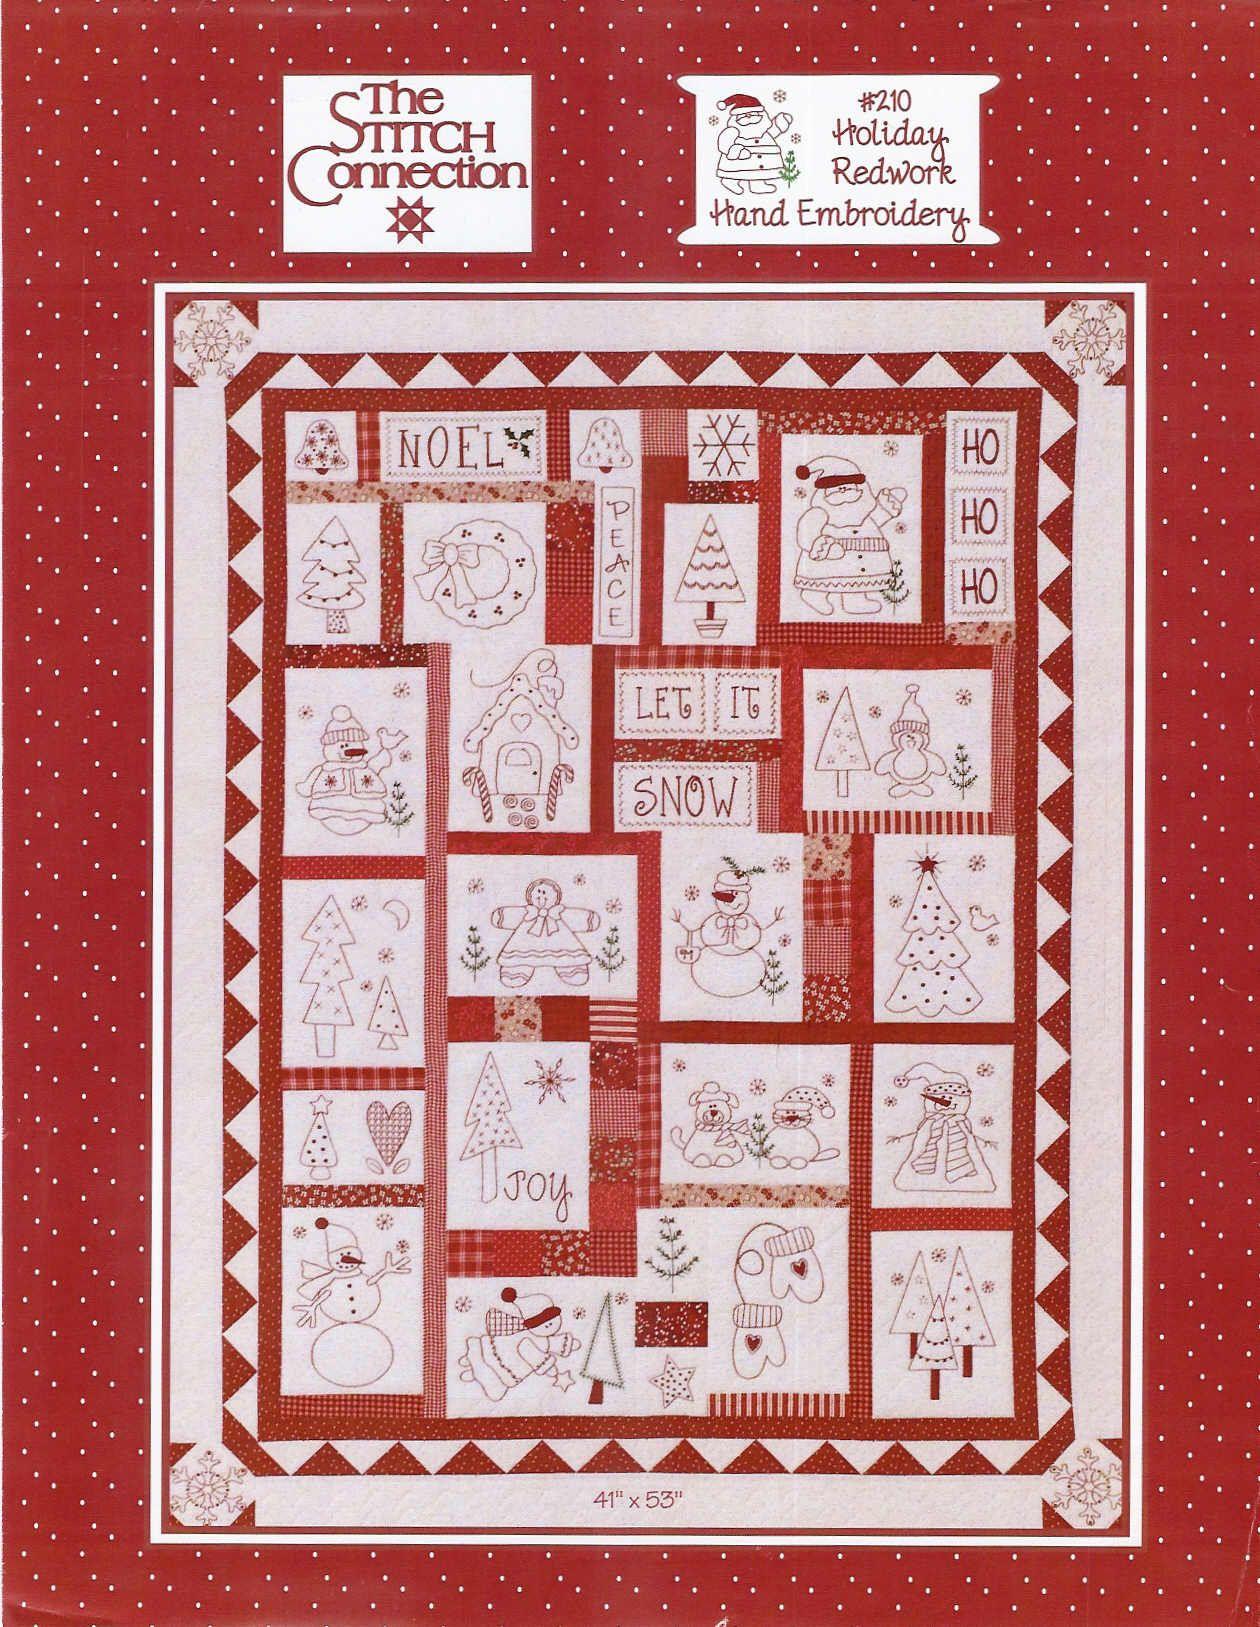 Free Redwork Quilt Patterns | EMBROIDERY REDWORK PATTERNS | Browse ... : embroidered quilts patterns - Adamdwight.com